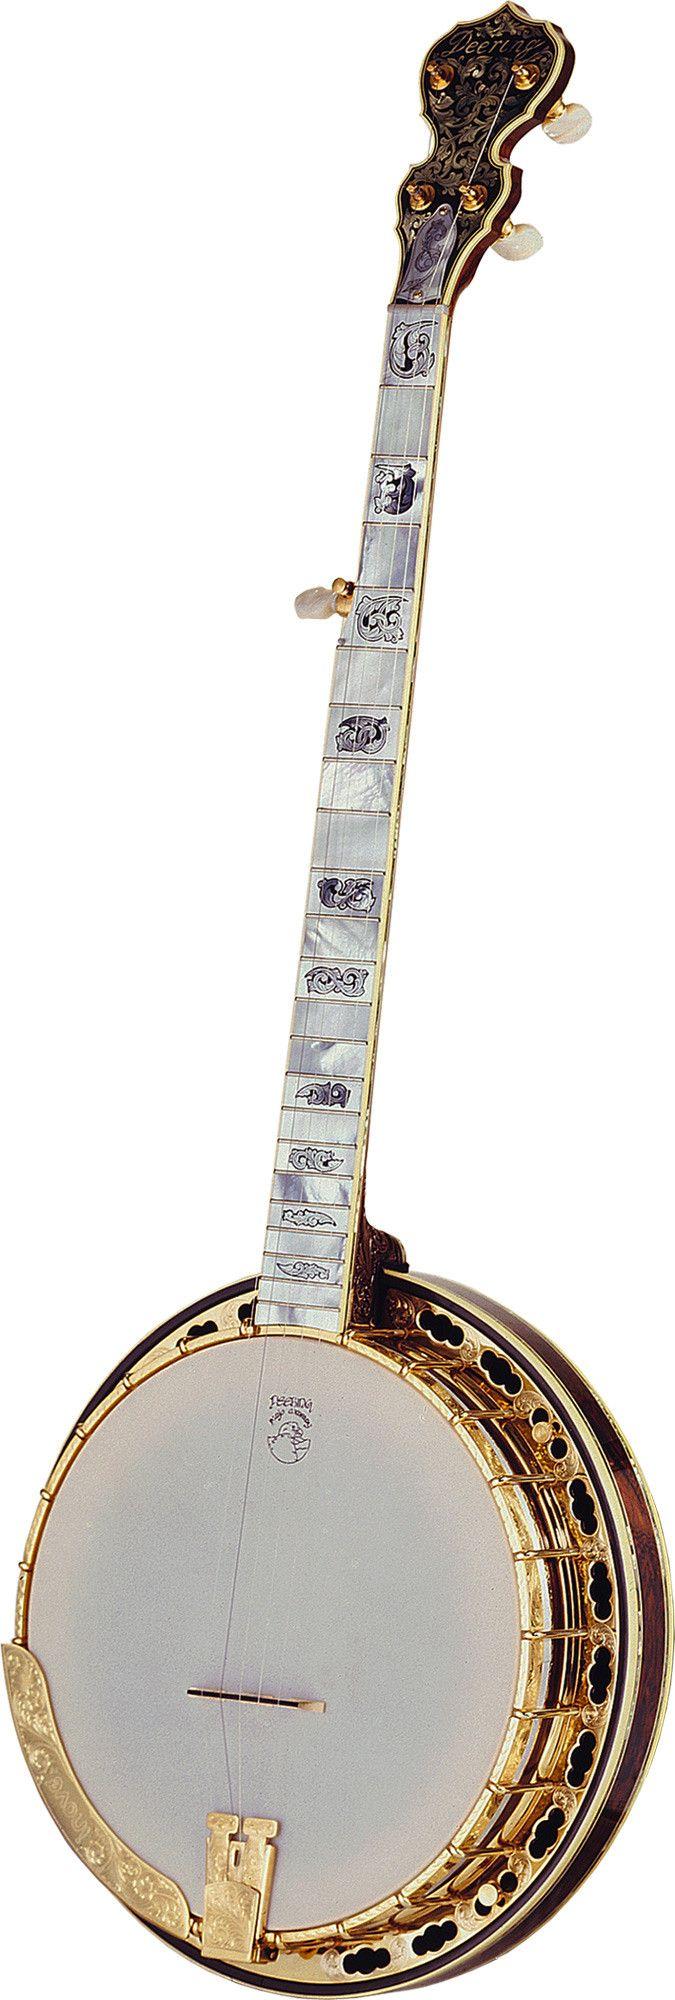 Deering Gabriella 5-string banjo